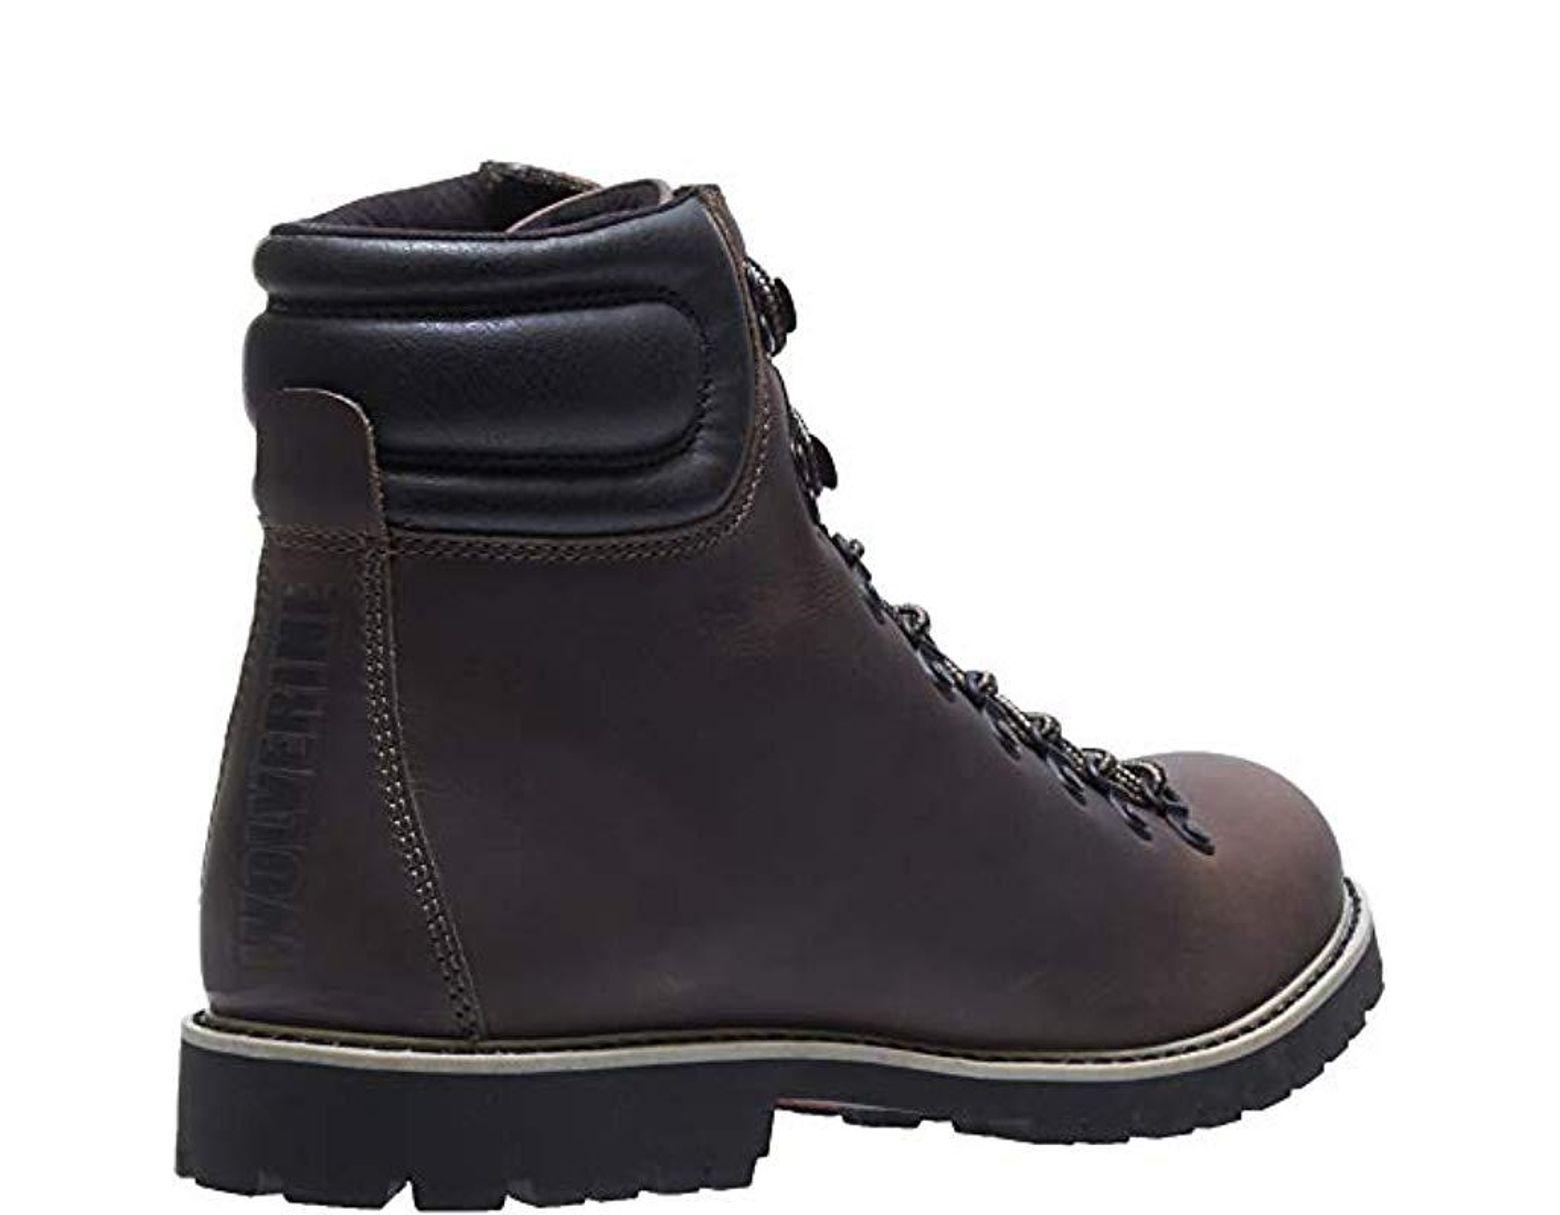 6ff9f60f45c Men's Frontiersman Fashion Boot